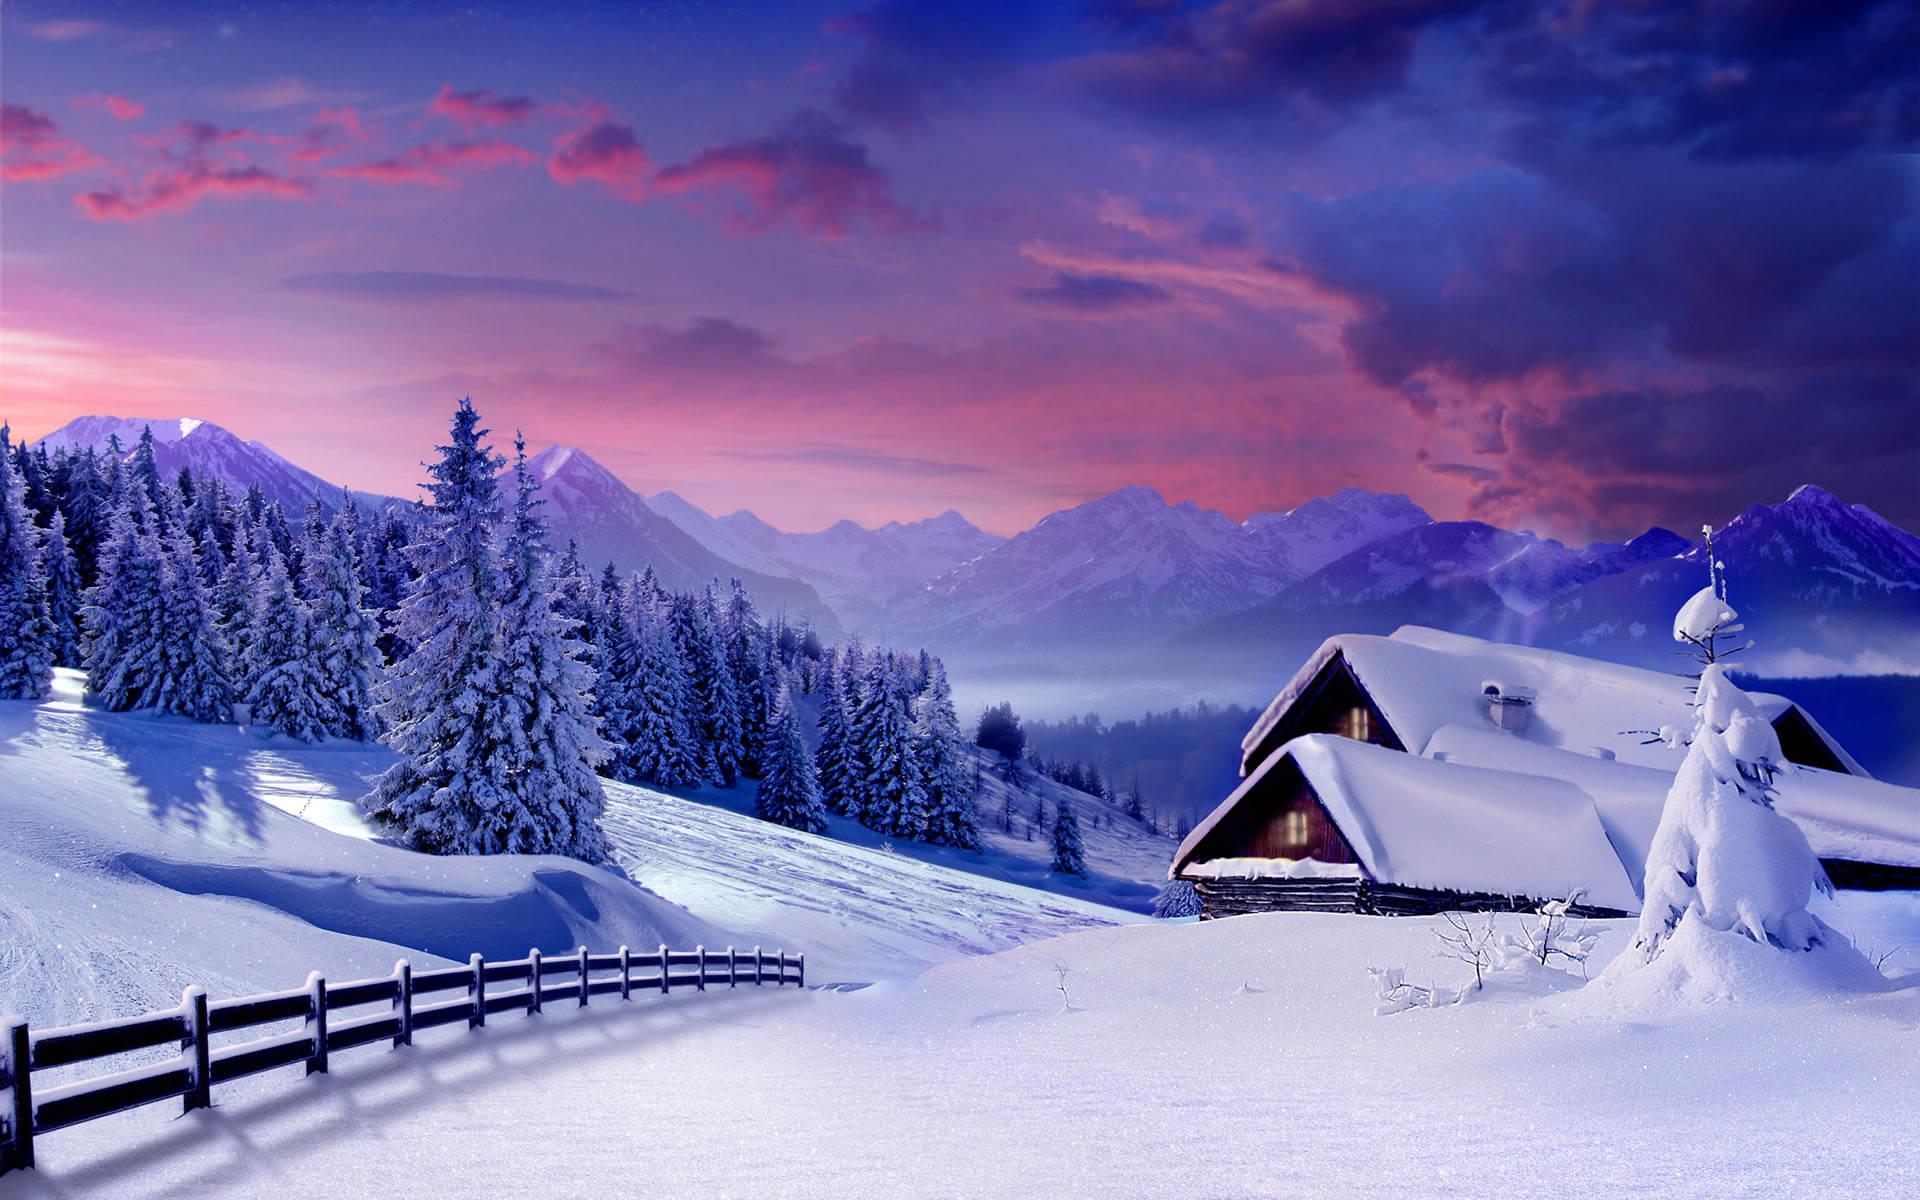 winter-wallpaper-17